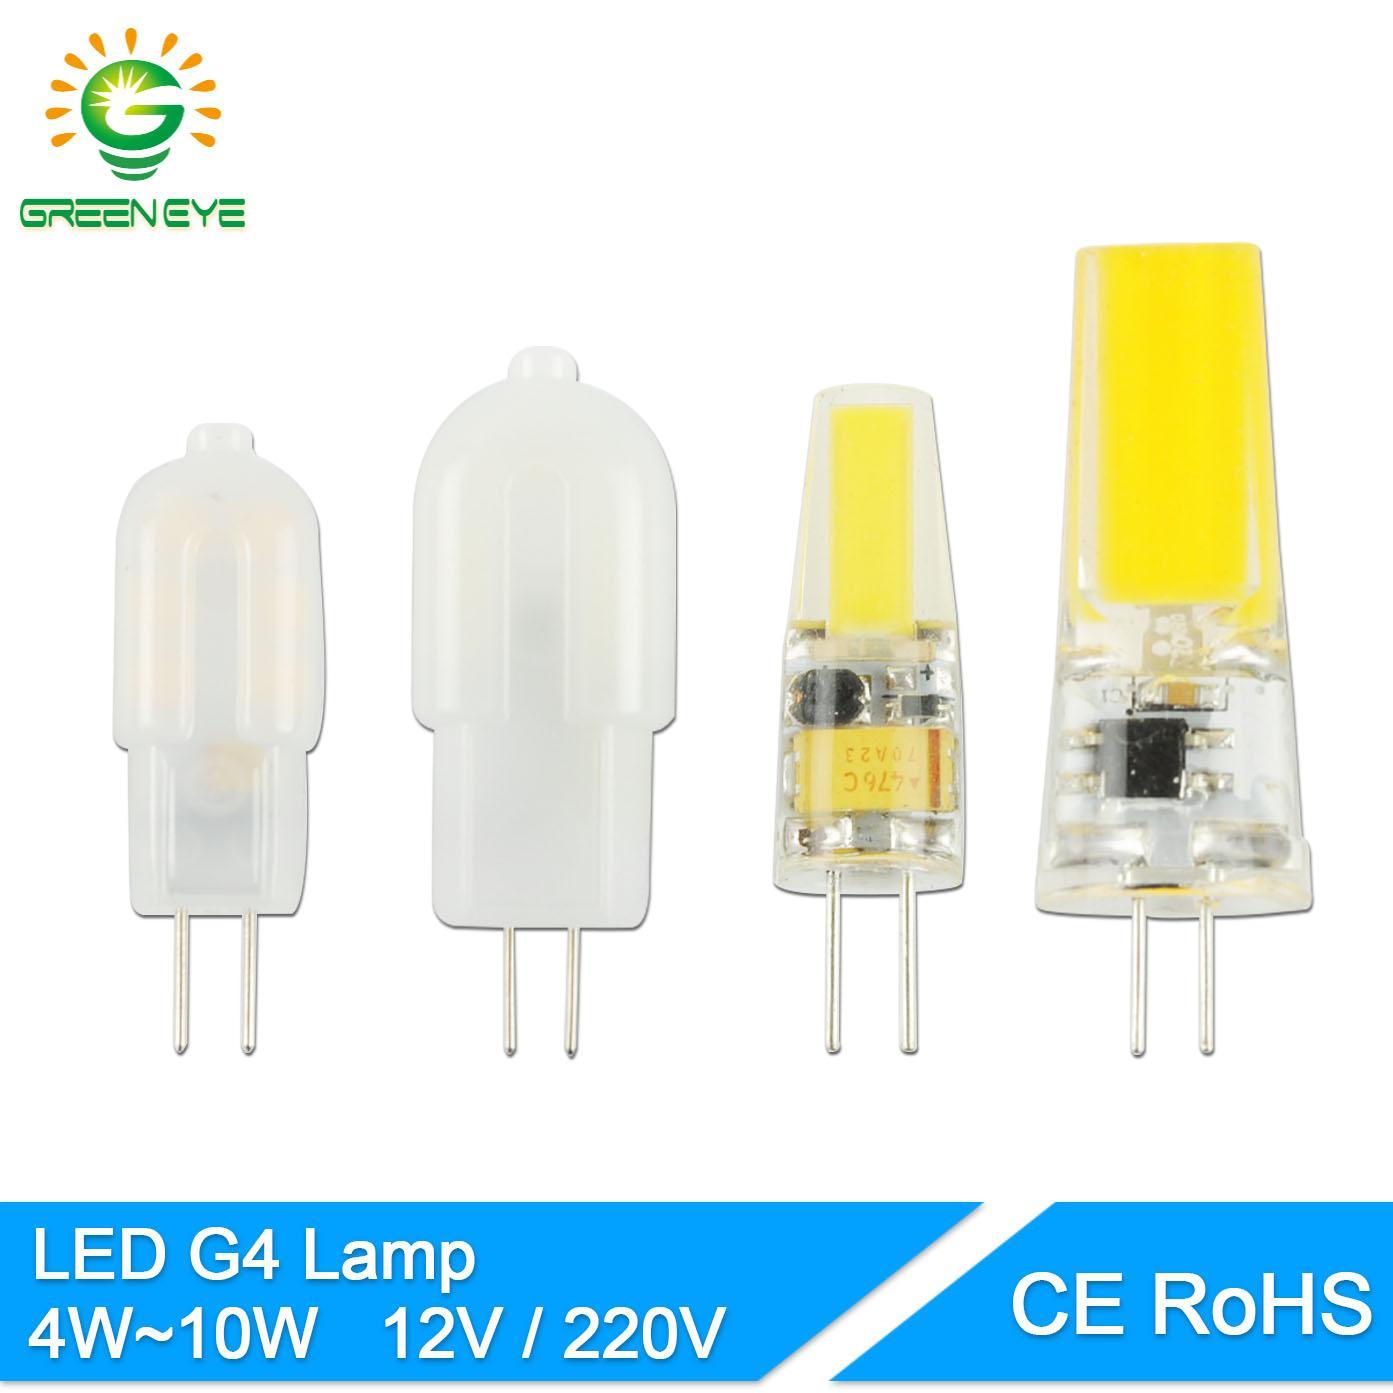 Lampadine Led G4 12v.Greeneye G4 Dimmable Ac Dc 12v 220v Mini Led G4 Lamp Cob Led Bulb 4w